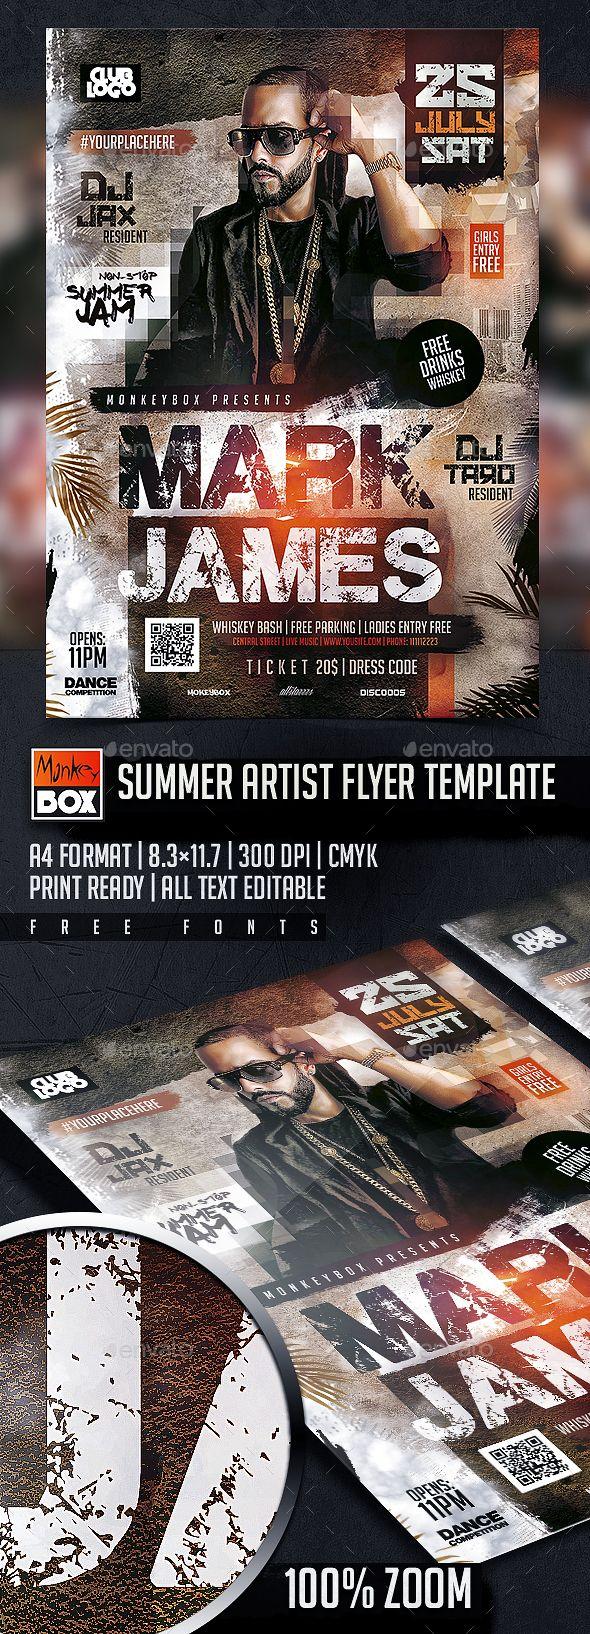 Summer Artist Flyer Template PSD. Download here: http://graphicriver.net/item/summer-artist-flyer-template/16668466?ref=ksioks